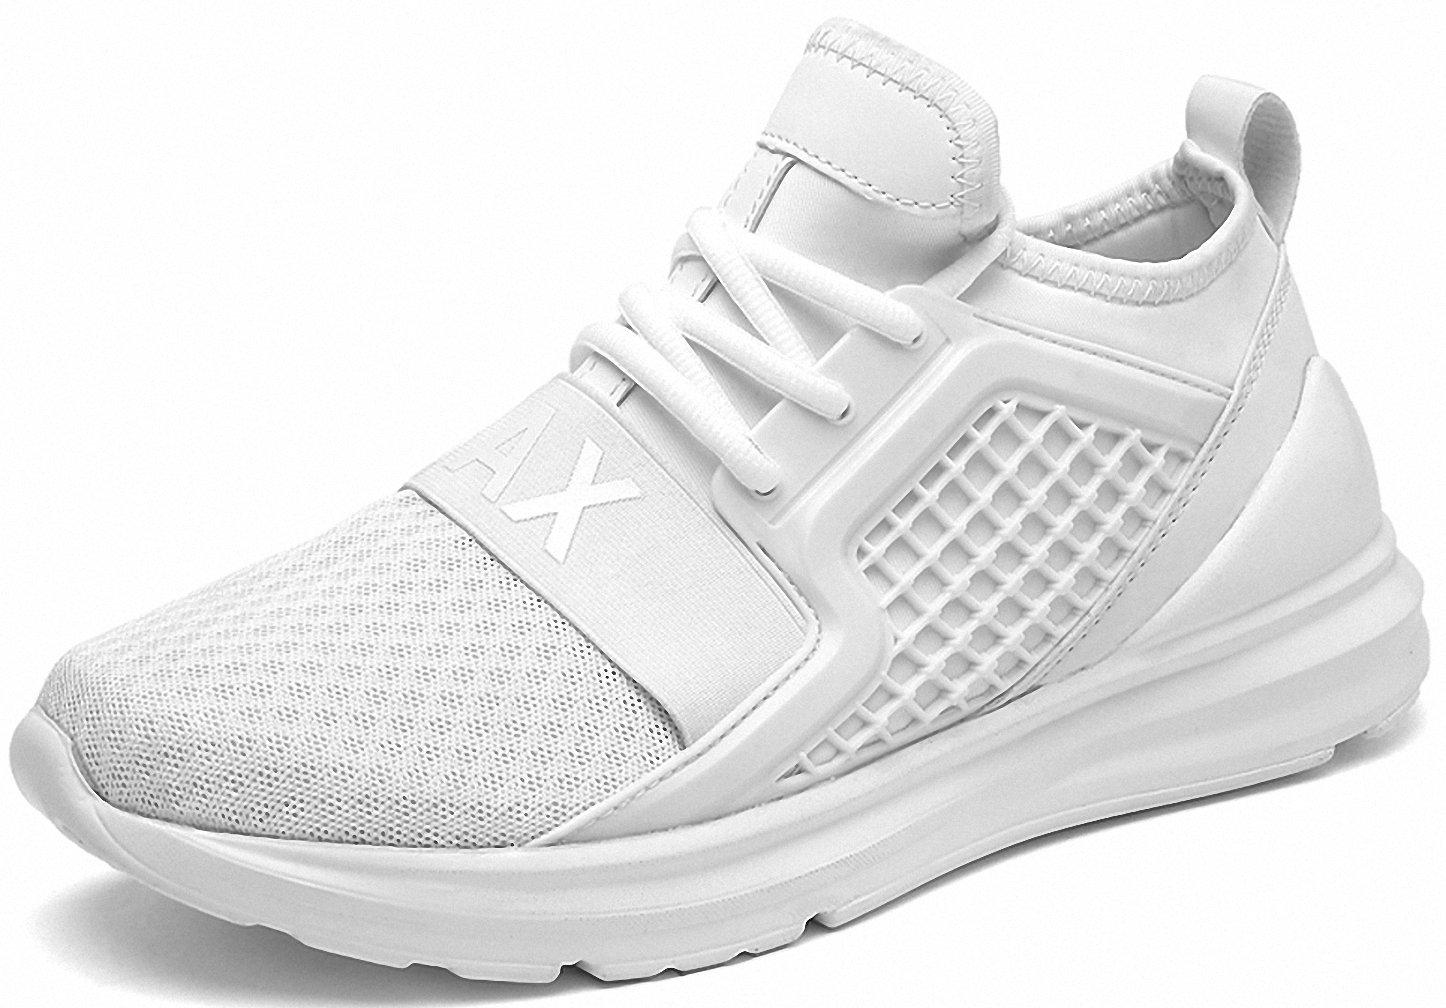 Weweya Men's Road Running Shoes Athletic Training Shoes Casual Walking Sneakers B07DNWFRWY 9 M US|White